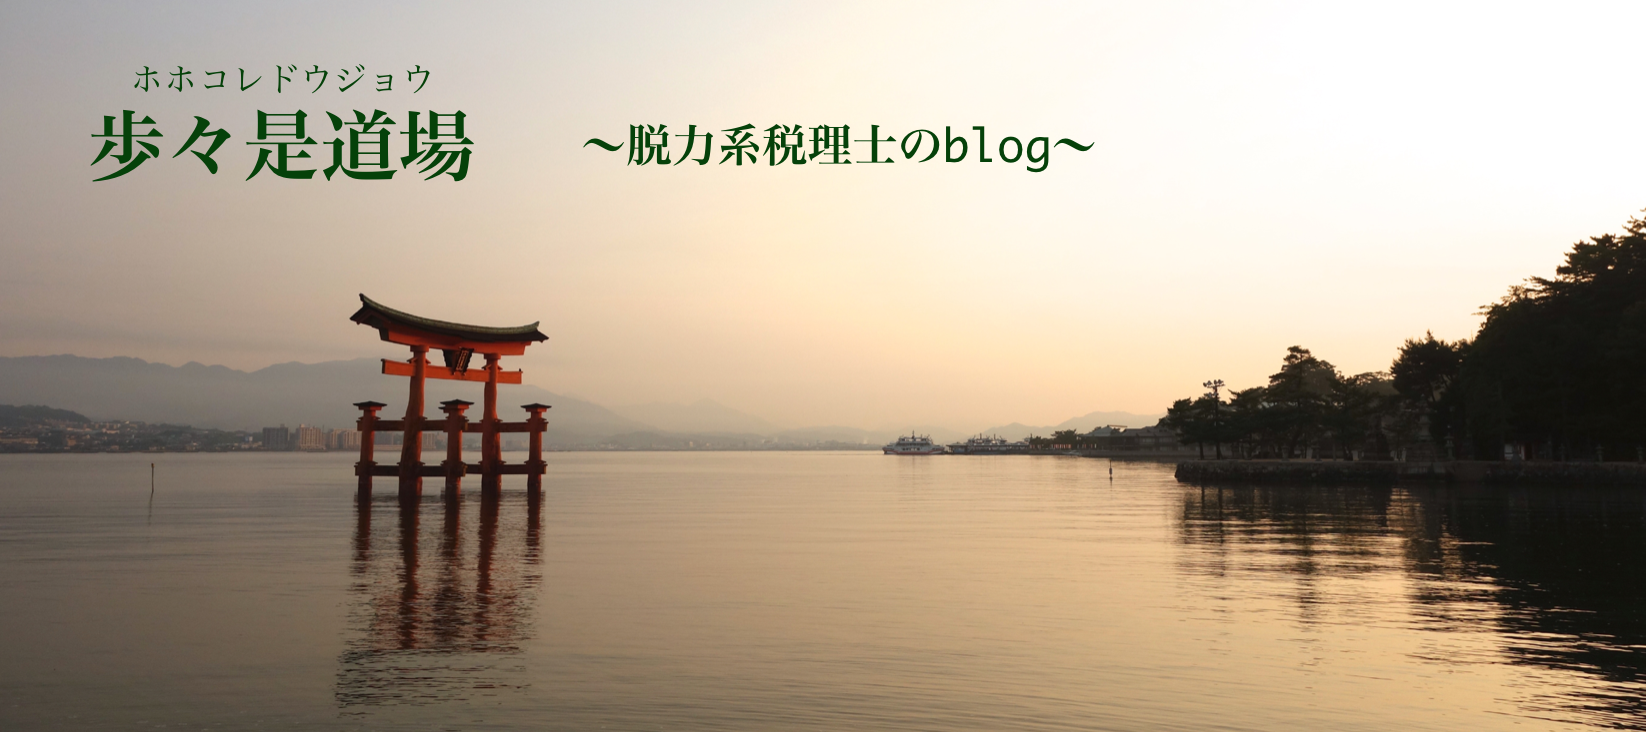 歩々是道場 〜脱力系税理士のblog〜